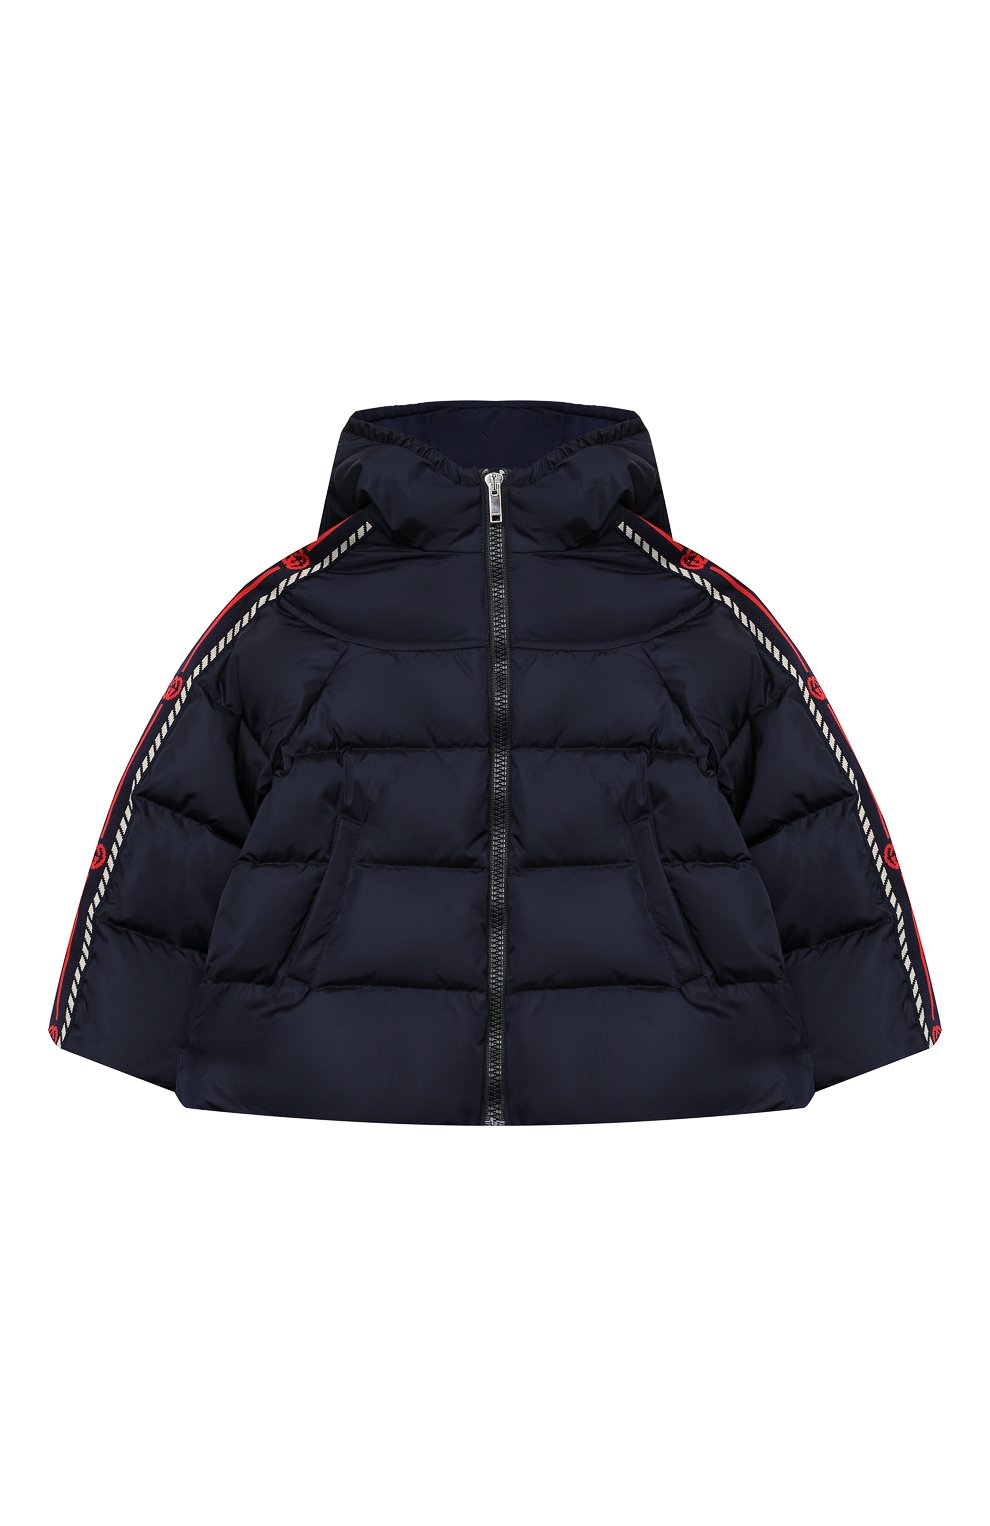 Детского пуховая куртка GUCCI синего цвета, арт. 622832/XWAK7 | Фото 1